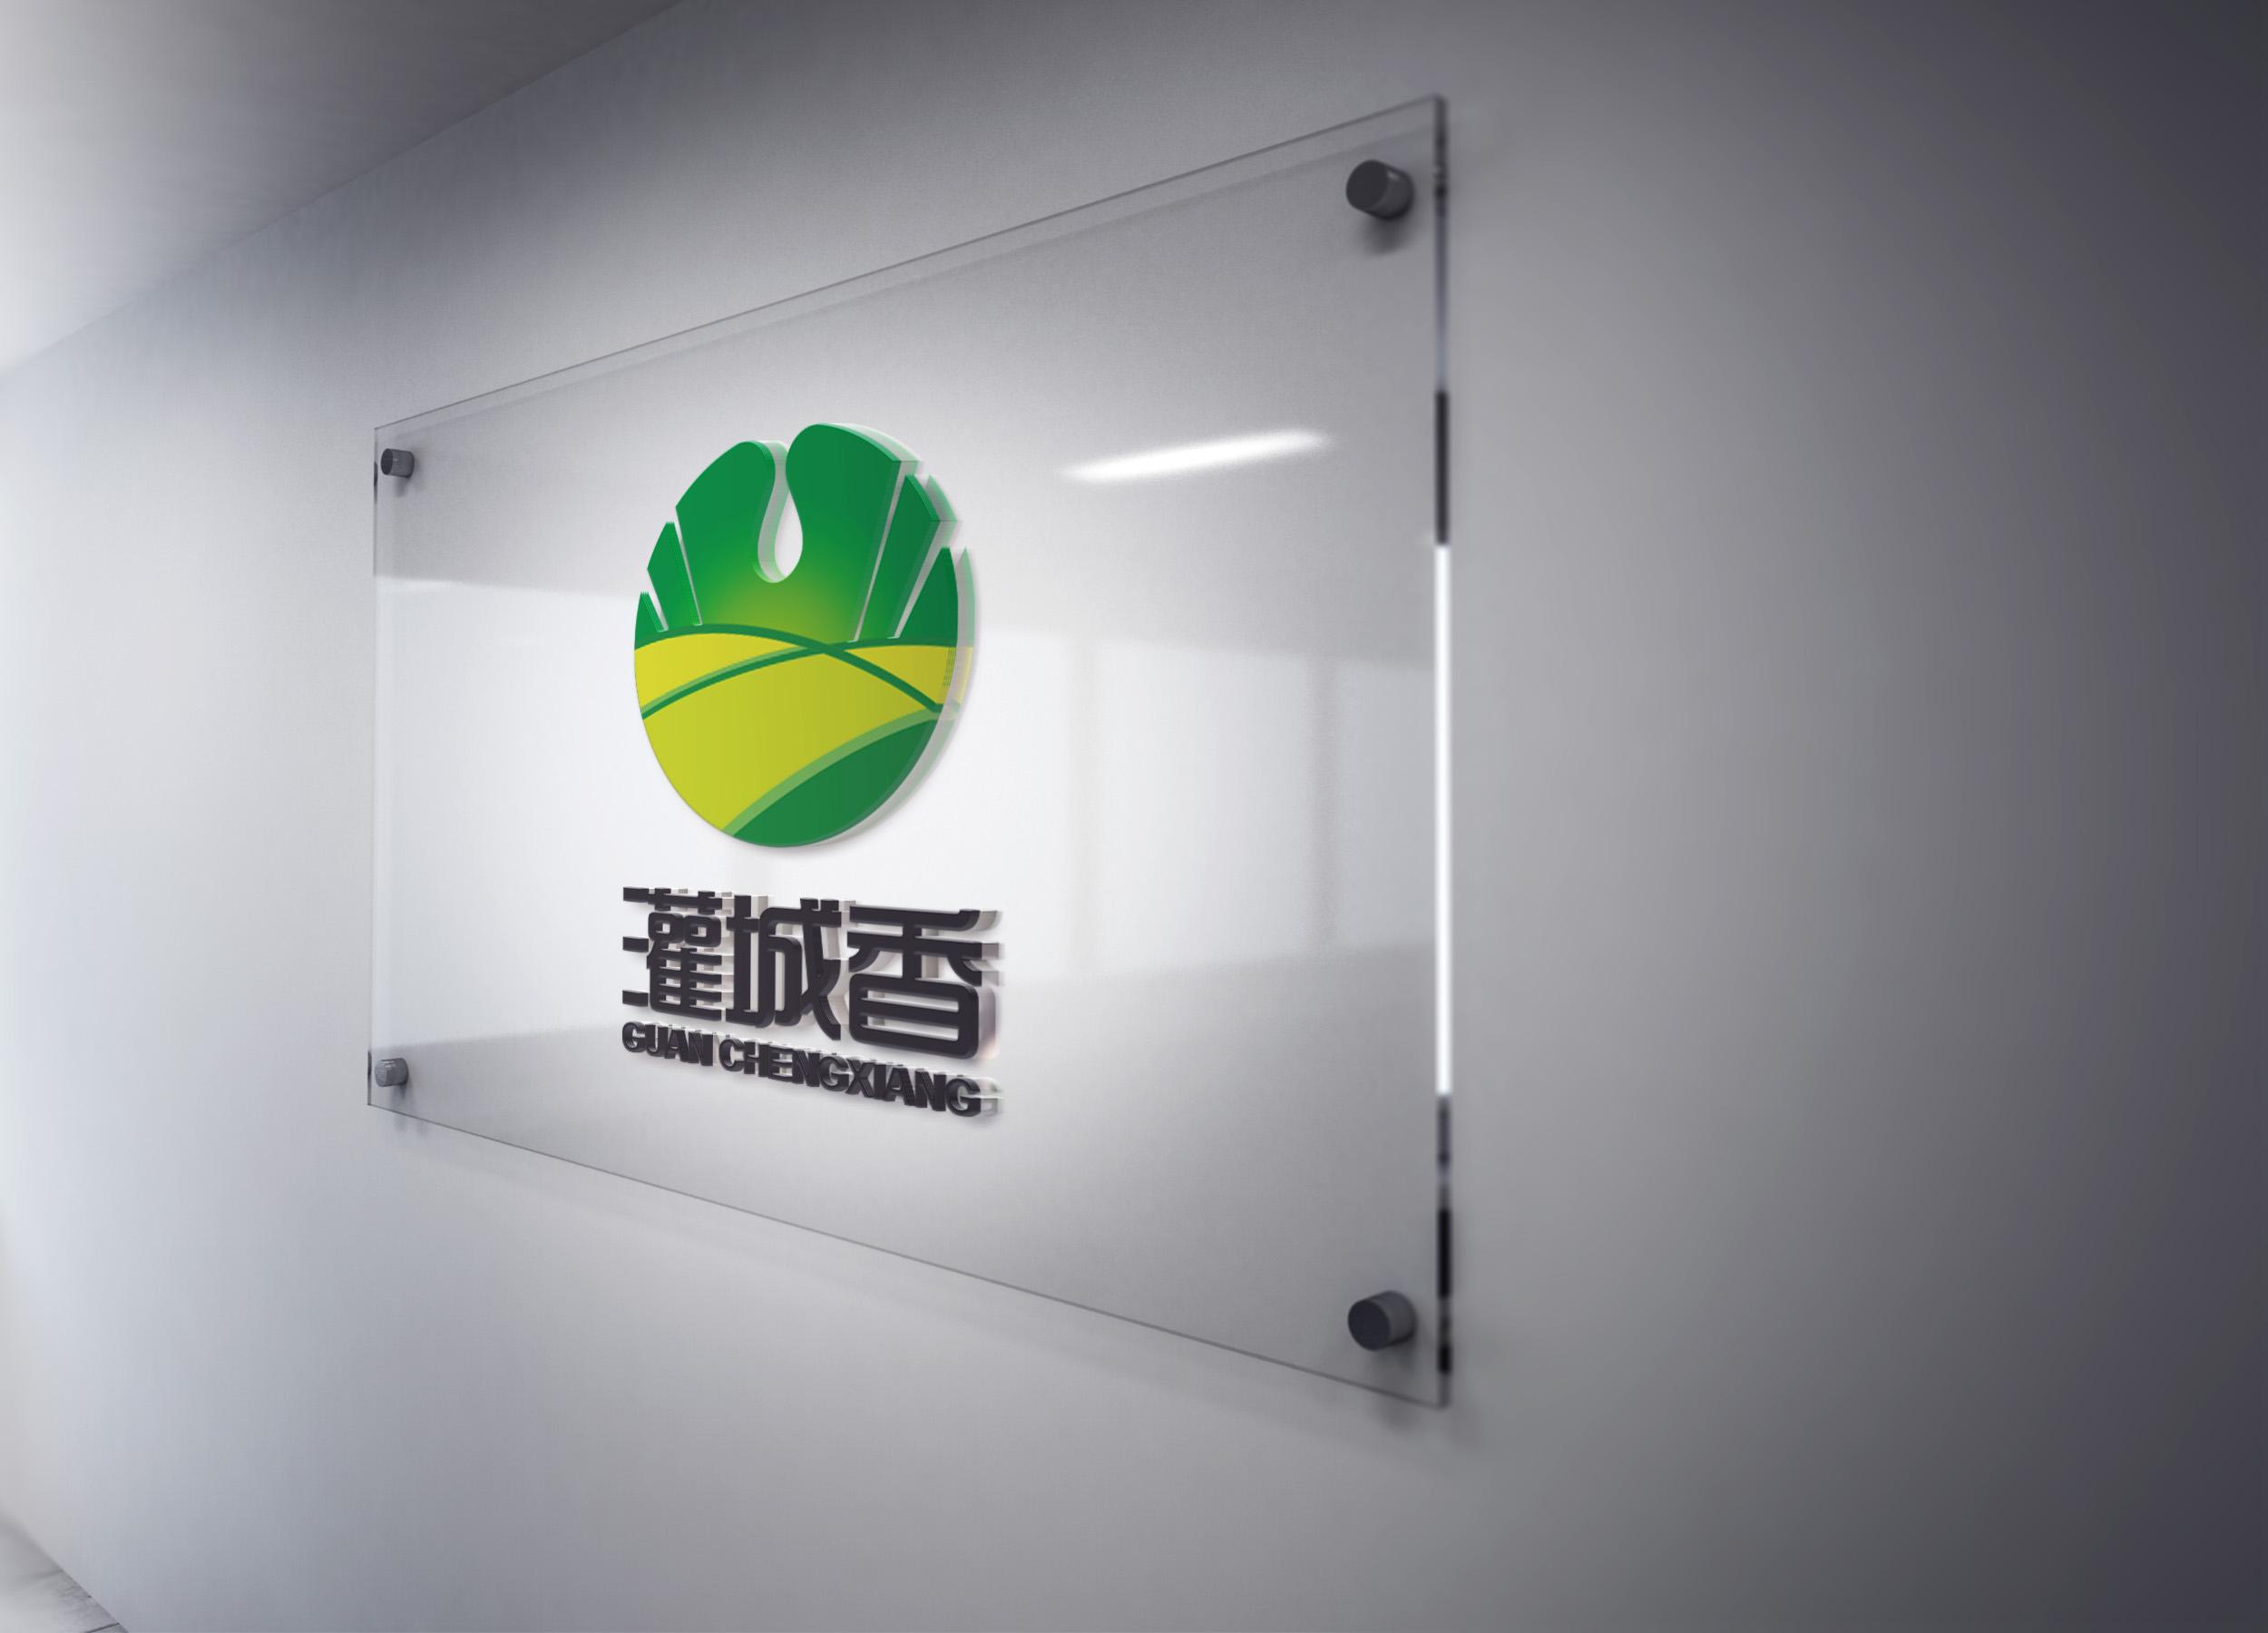 LOGO创意设计,品牌:灌城香(6.11附件有更新)_3033599_k68威客网